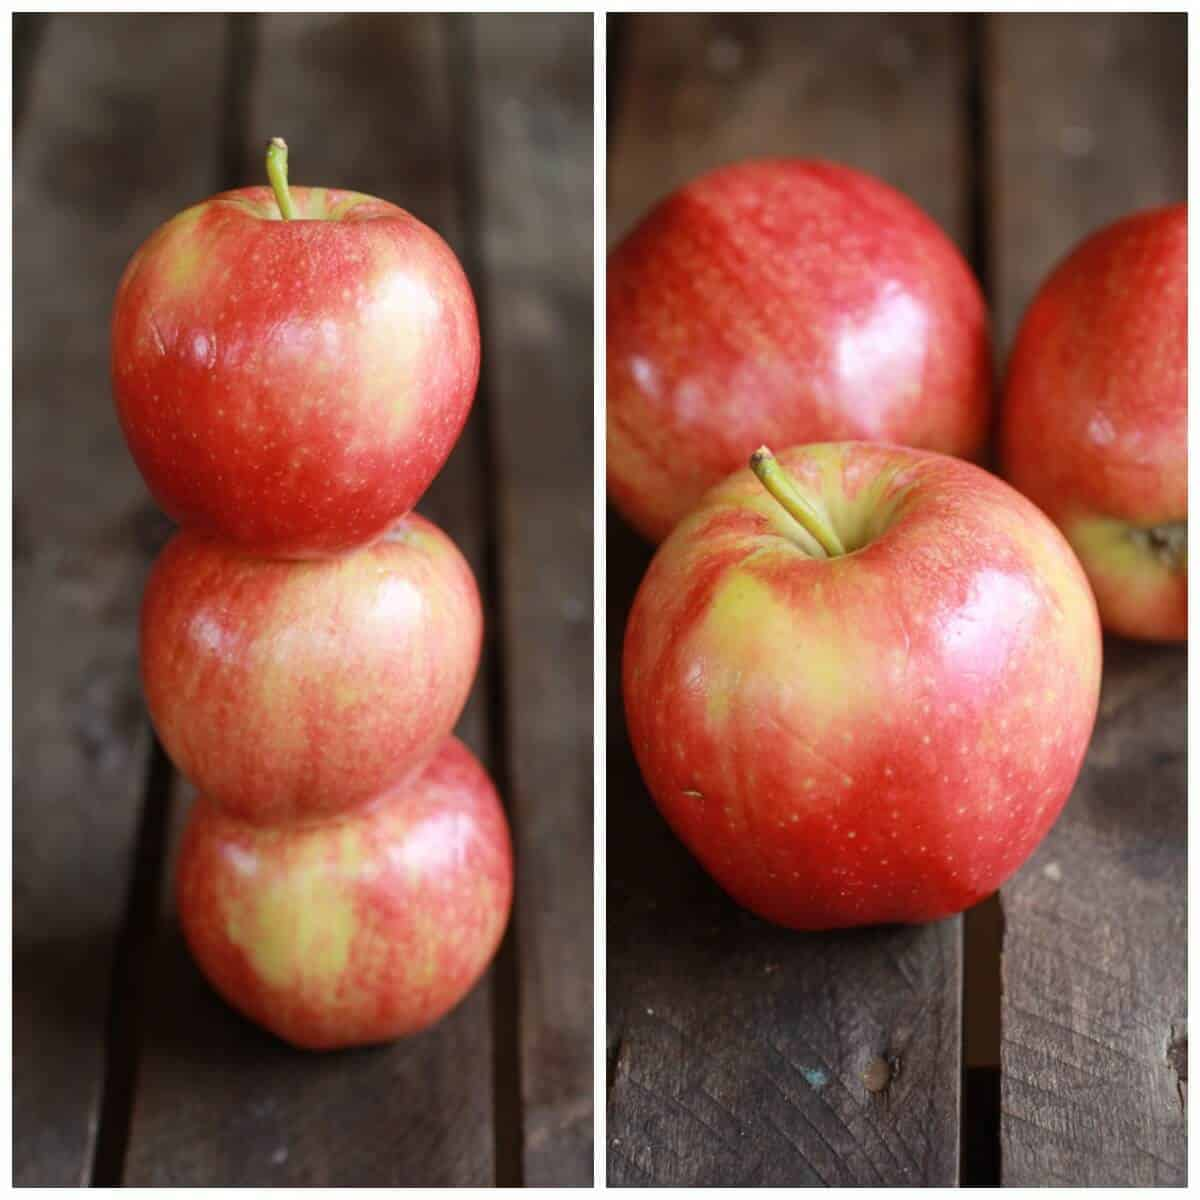 Apple Pecan Pie Cronuts with Apple Cider Caramel Drizzle | halfbakedharvest.com